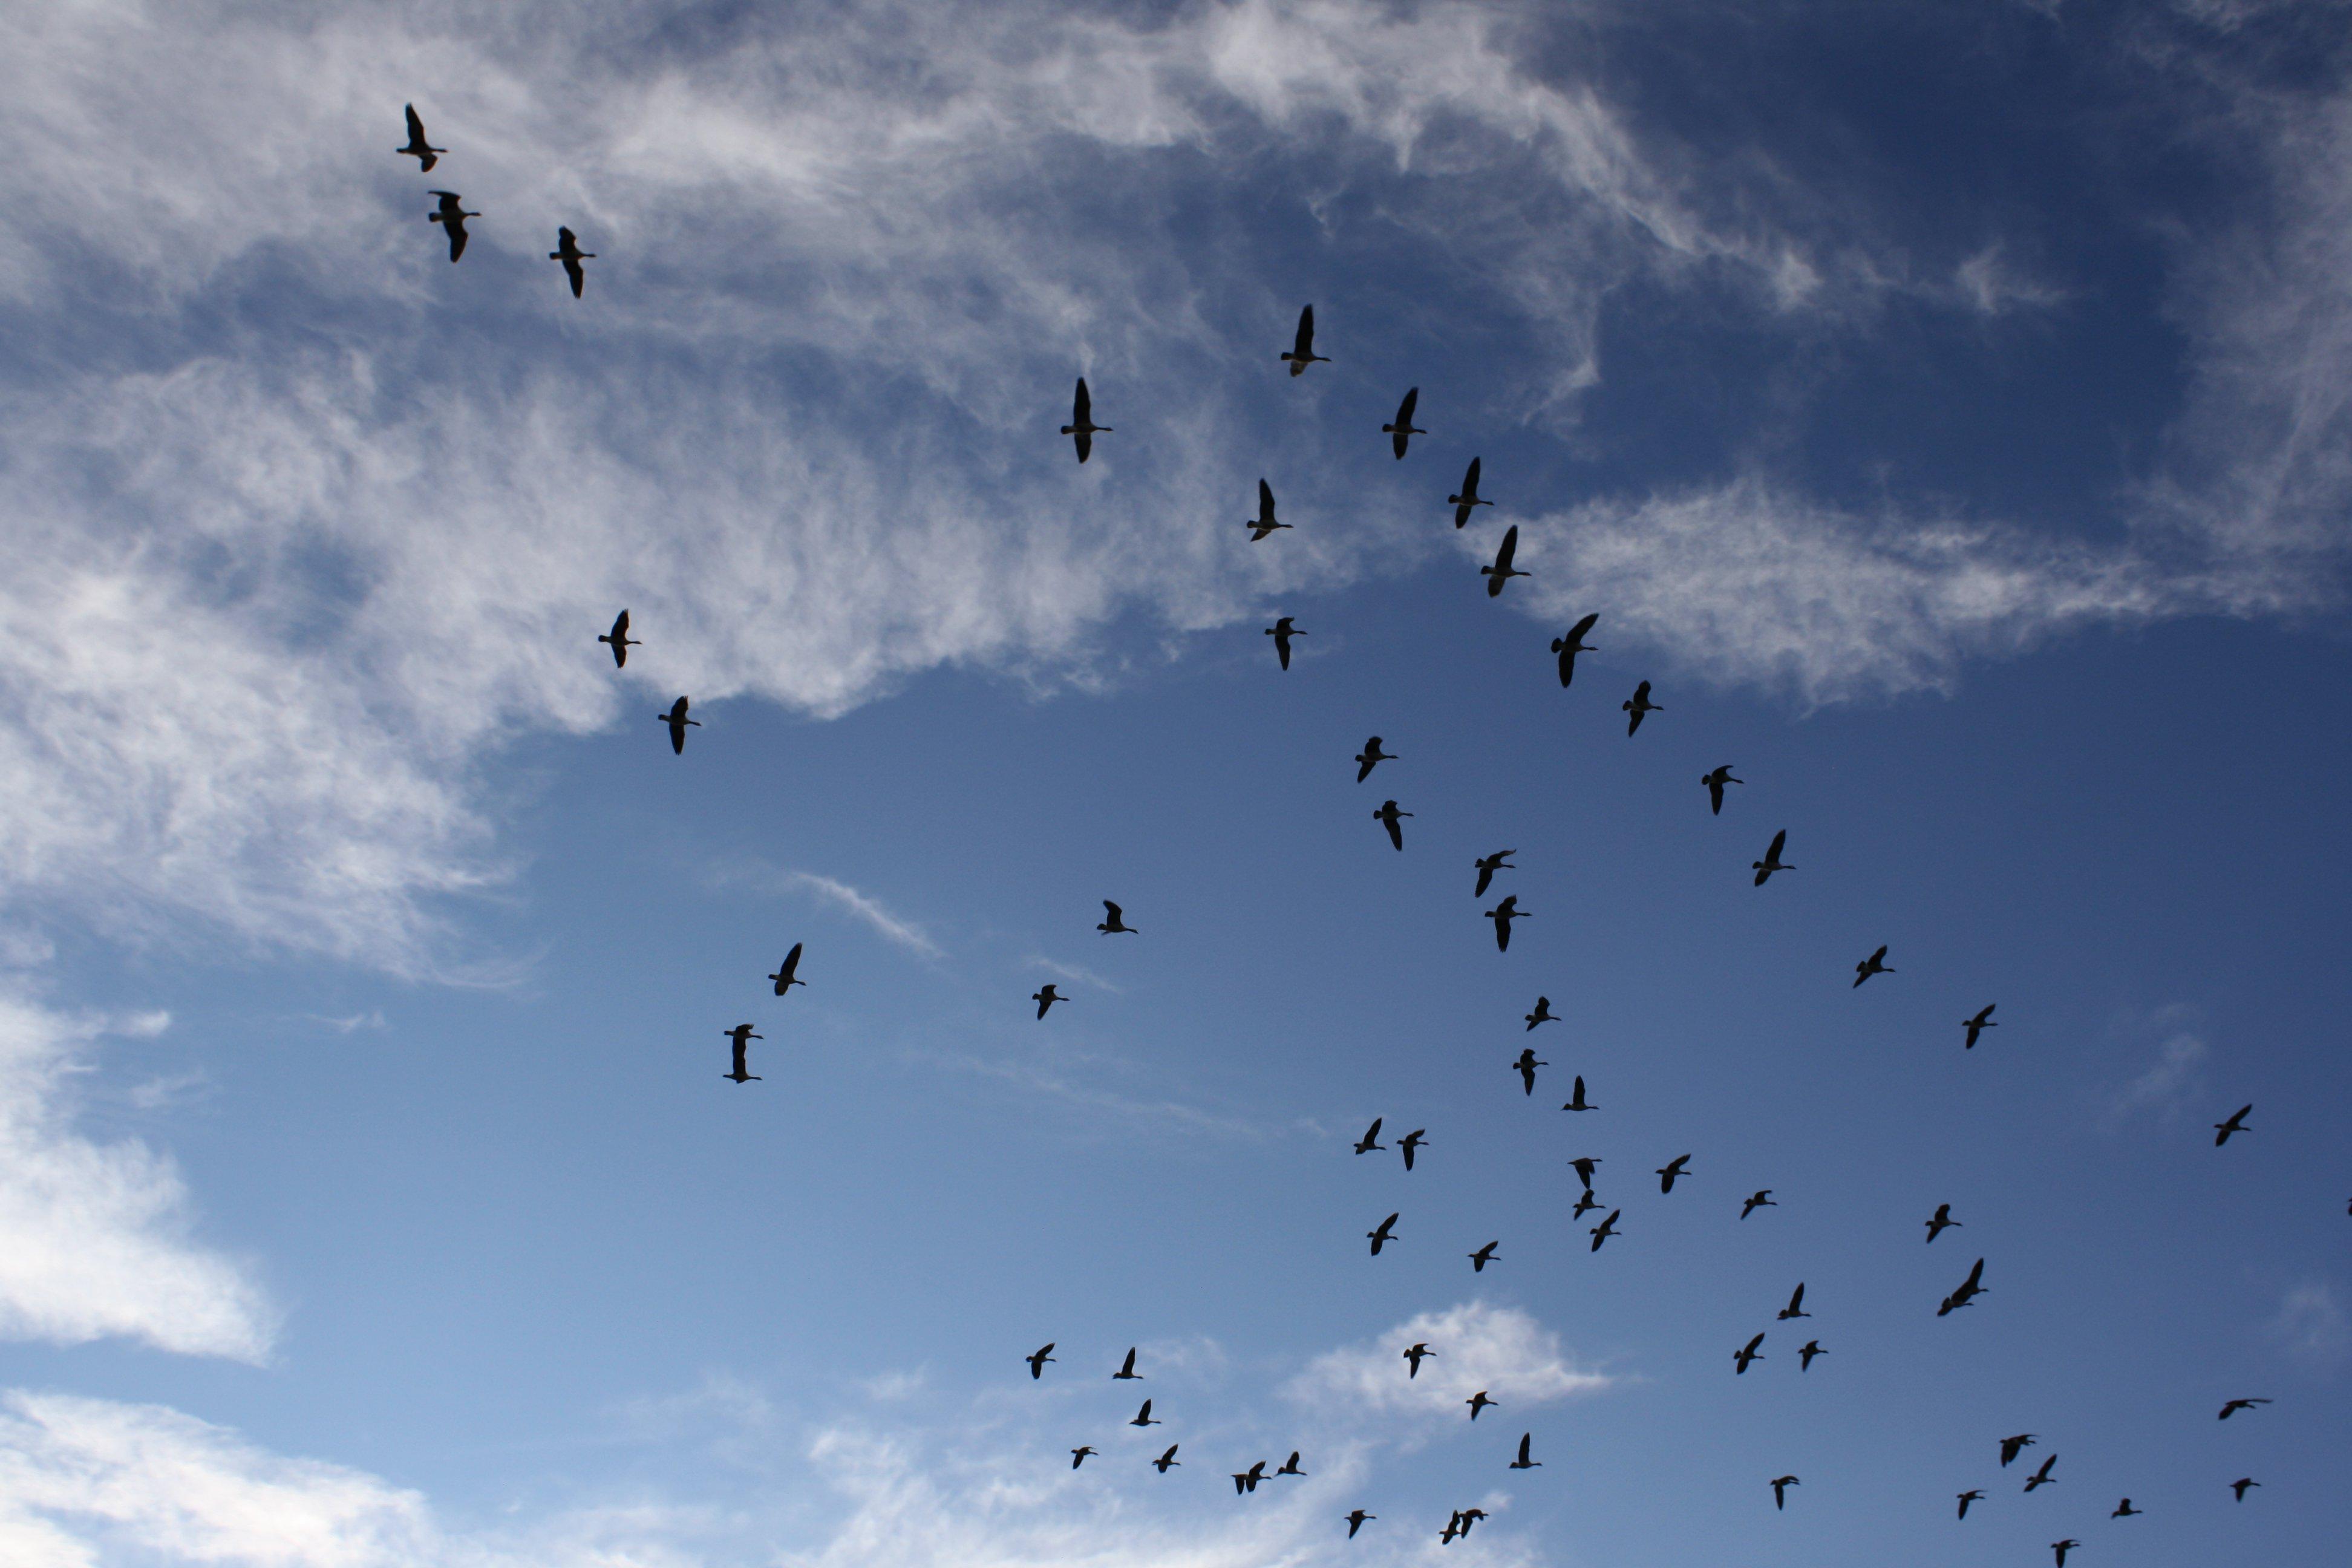 Birds flying in the sky - photo#6